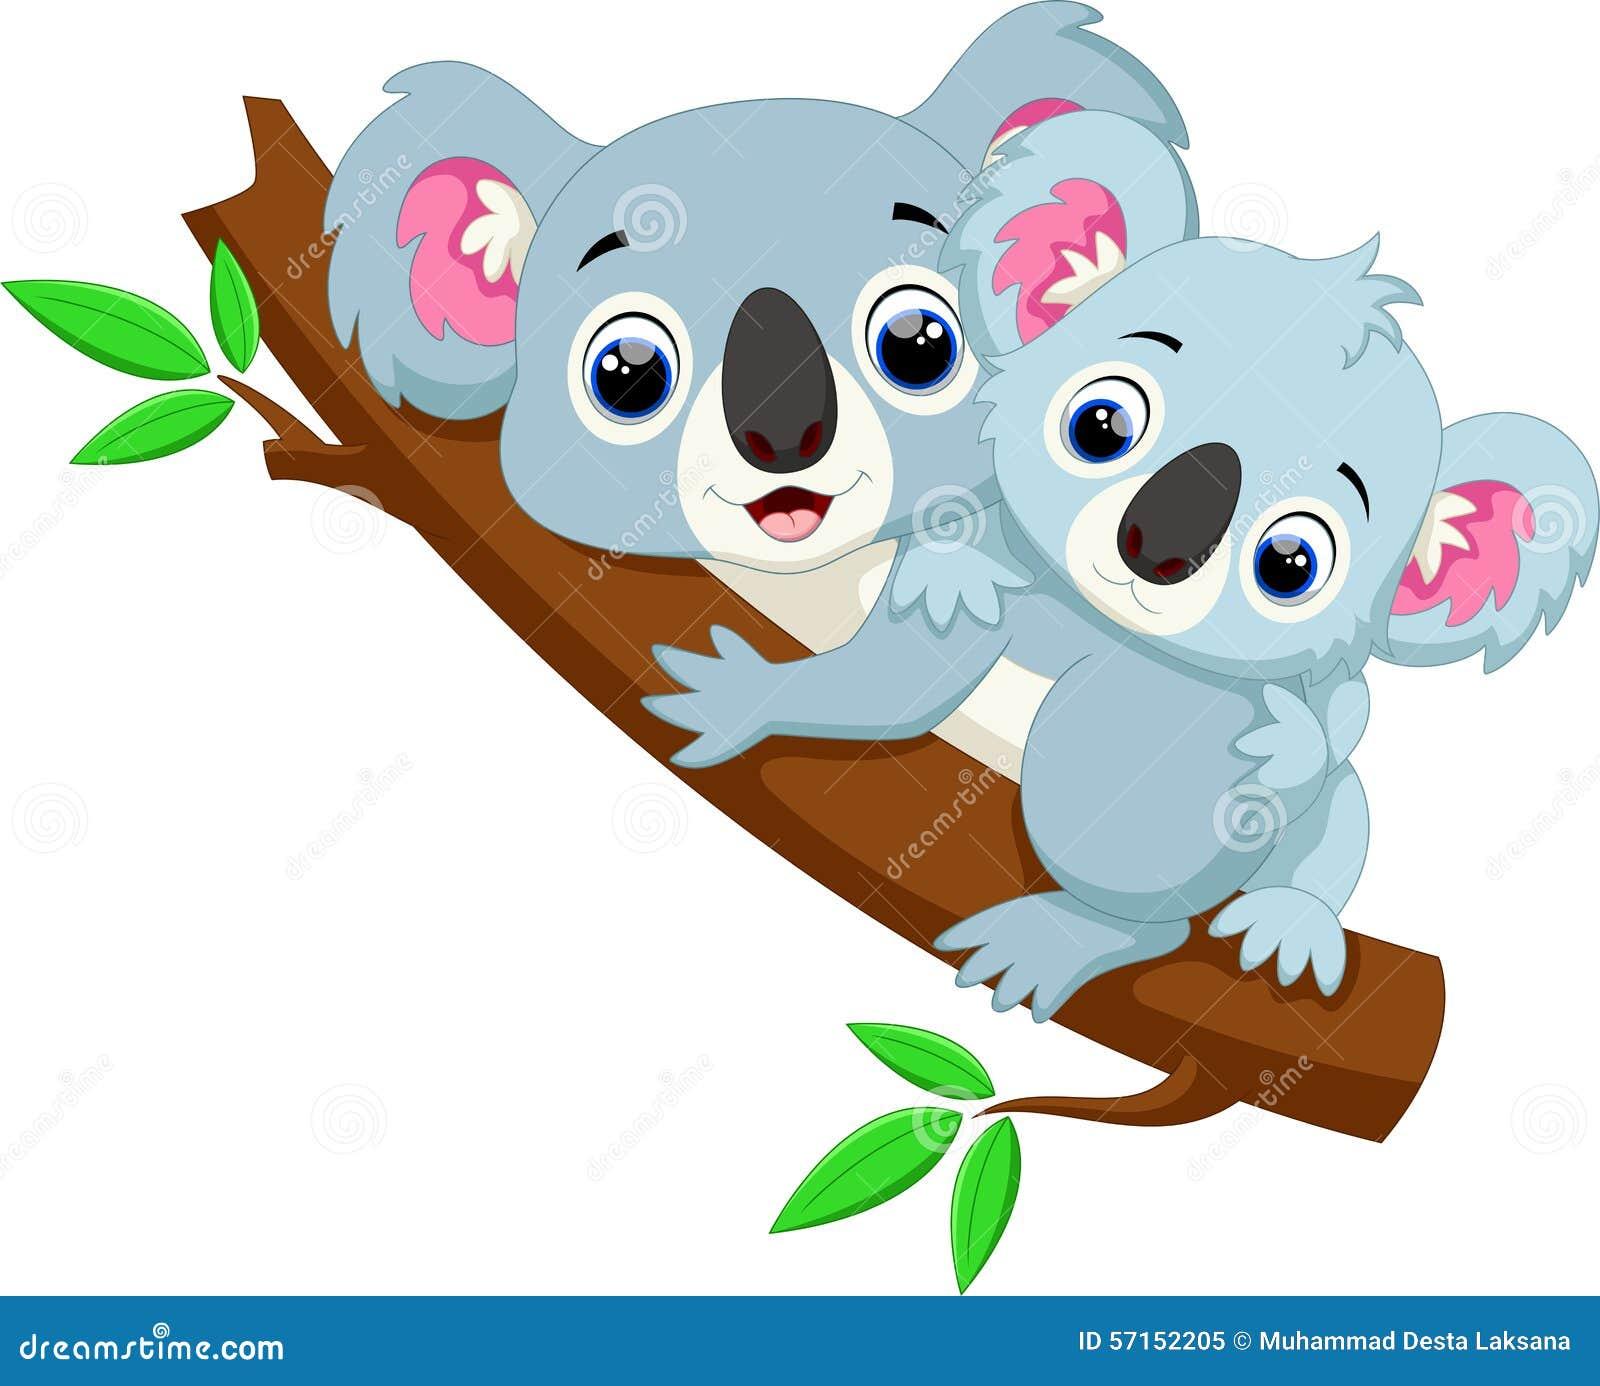 Cute Koala Cartoon On A Tree Stock Illustration ...